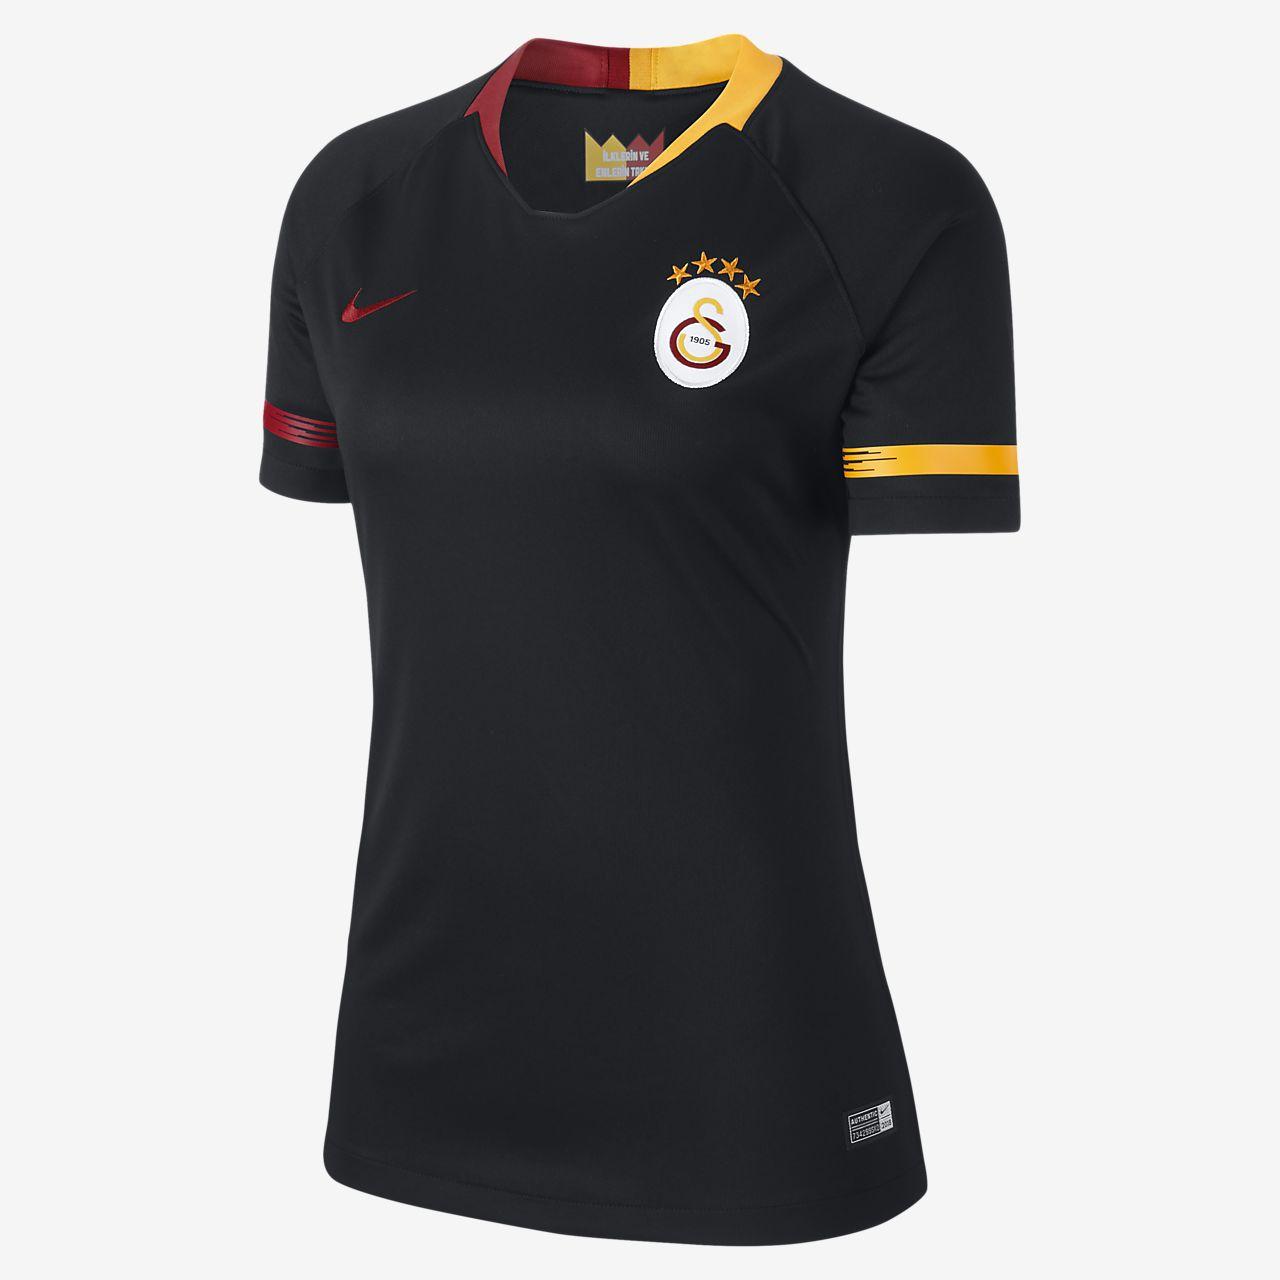 2018/19 Galatasaray S.K. Stadium Away Women's Football Shirt